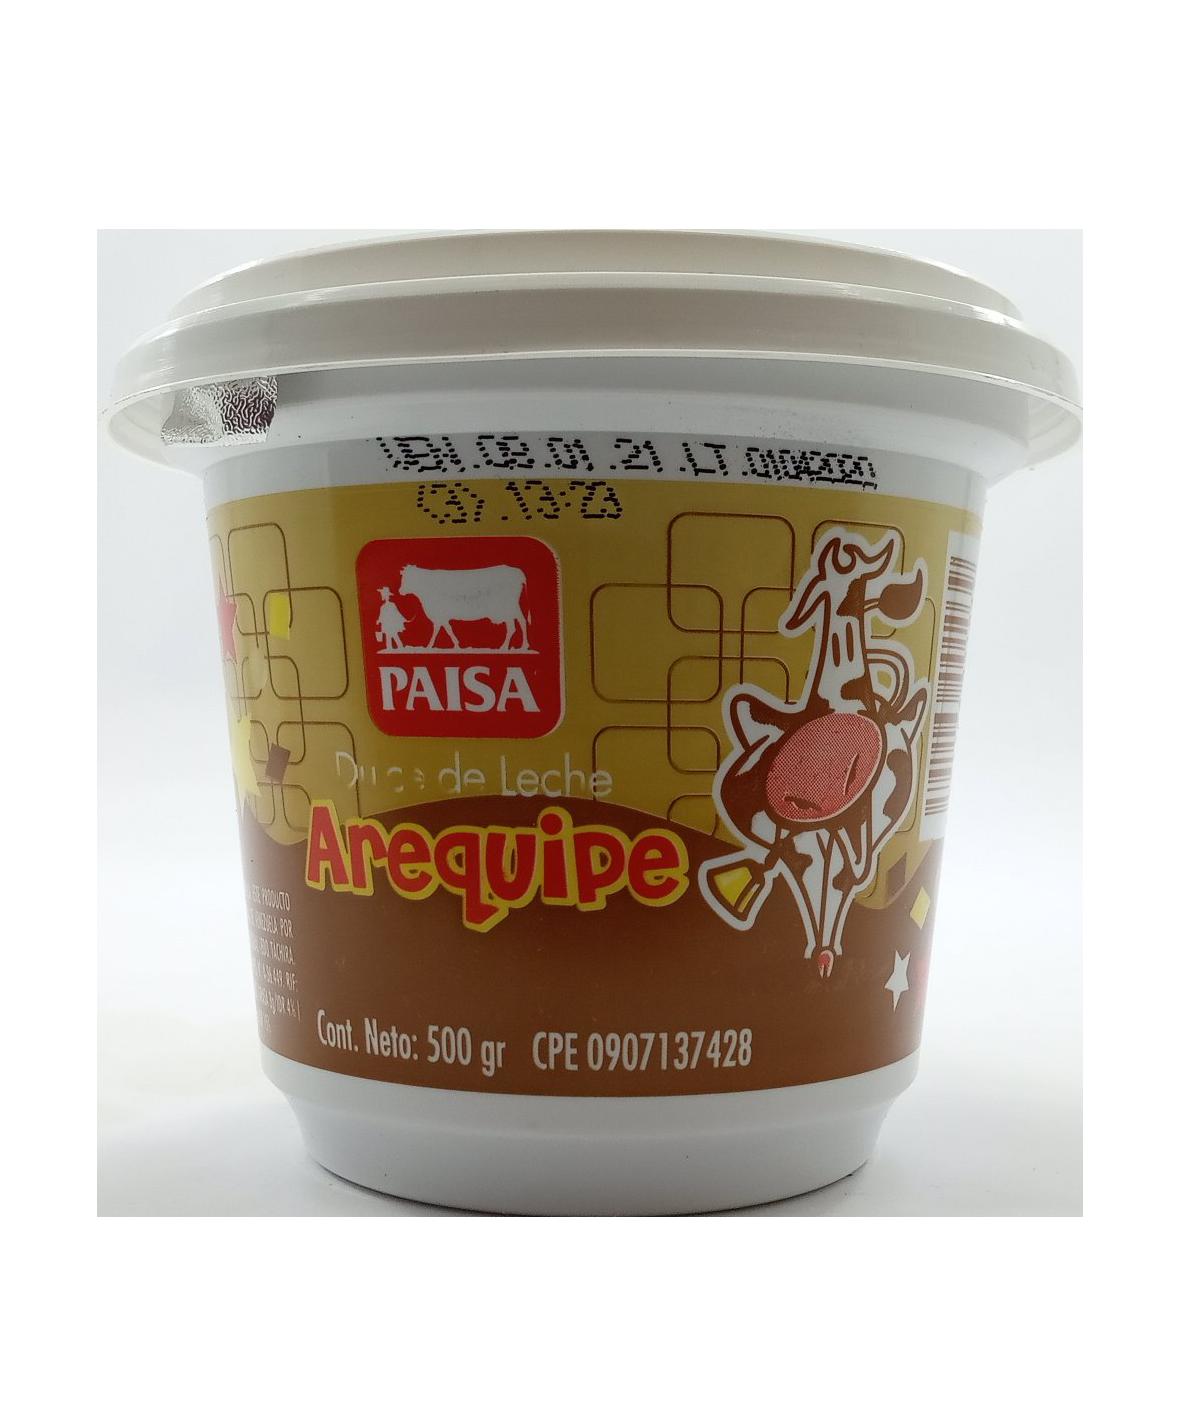 AREQUIPE PAISA 500 GR